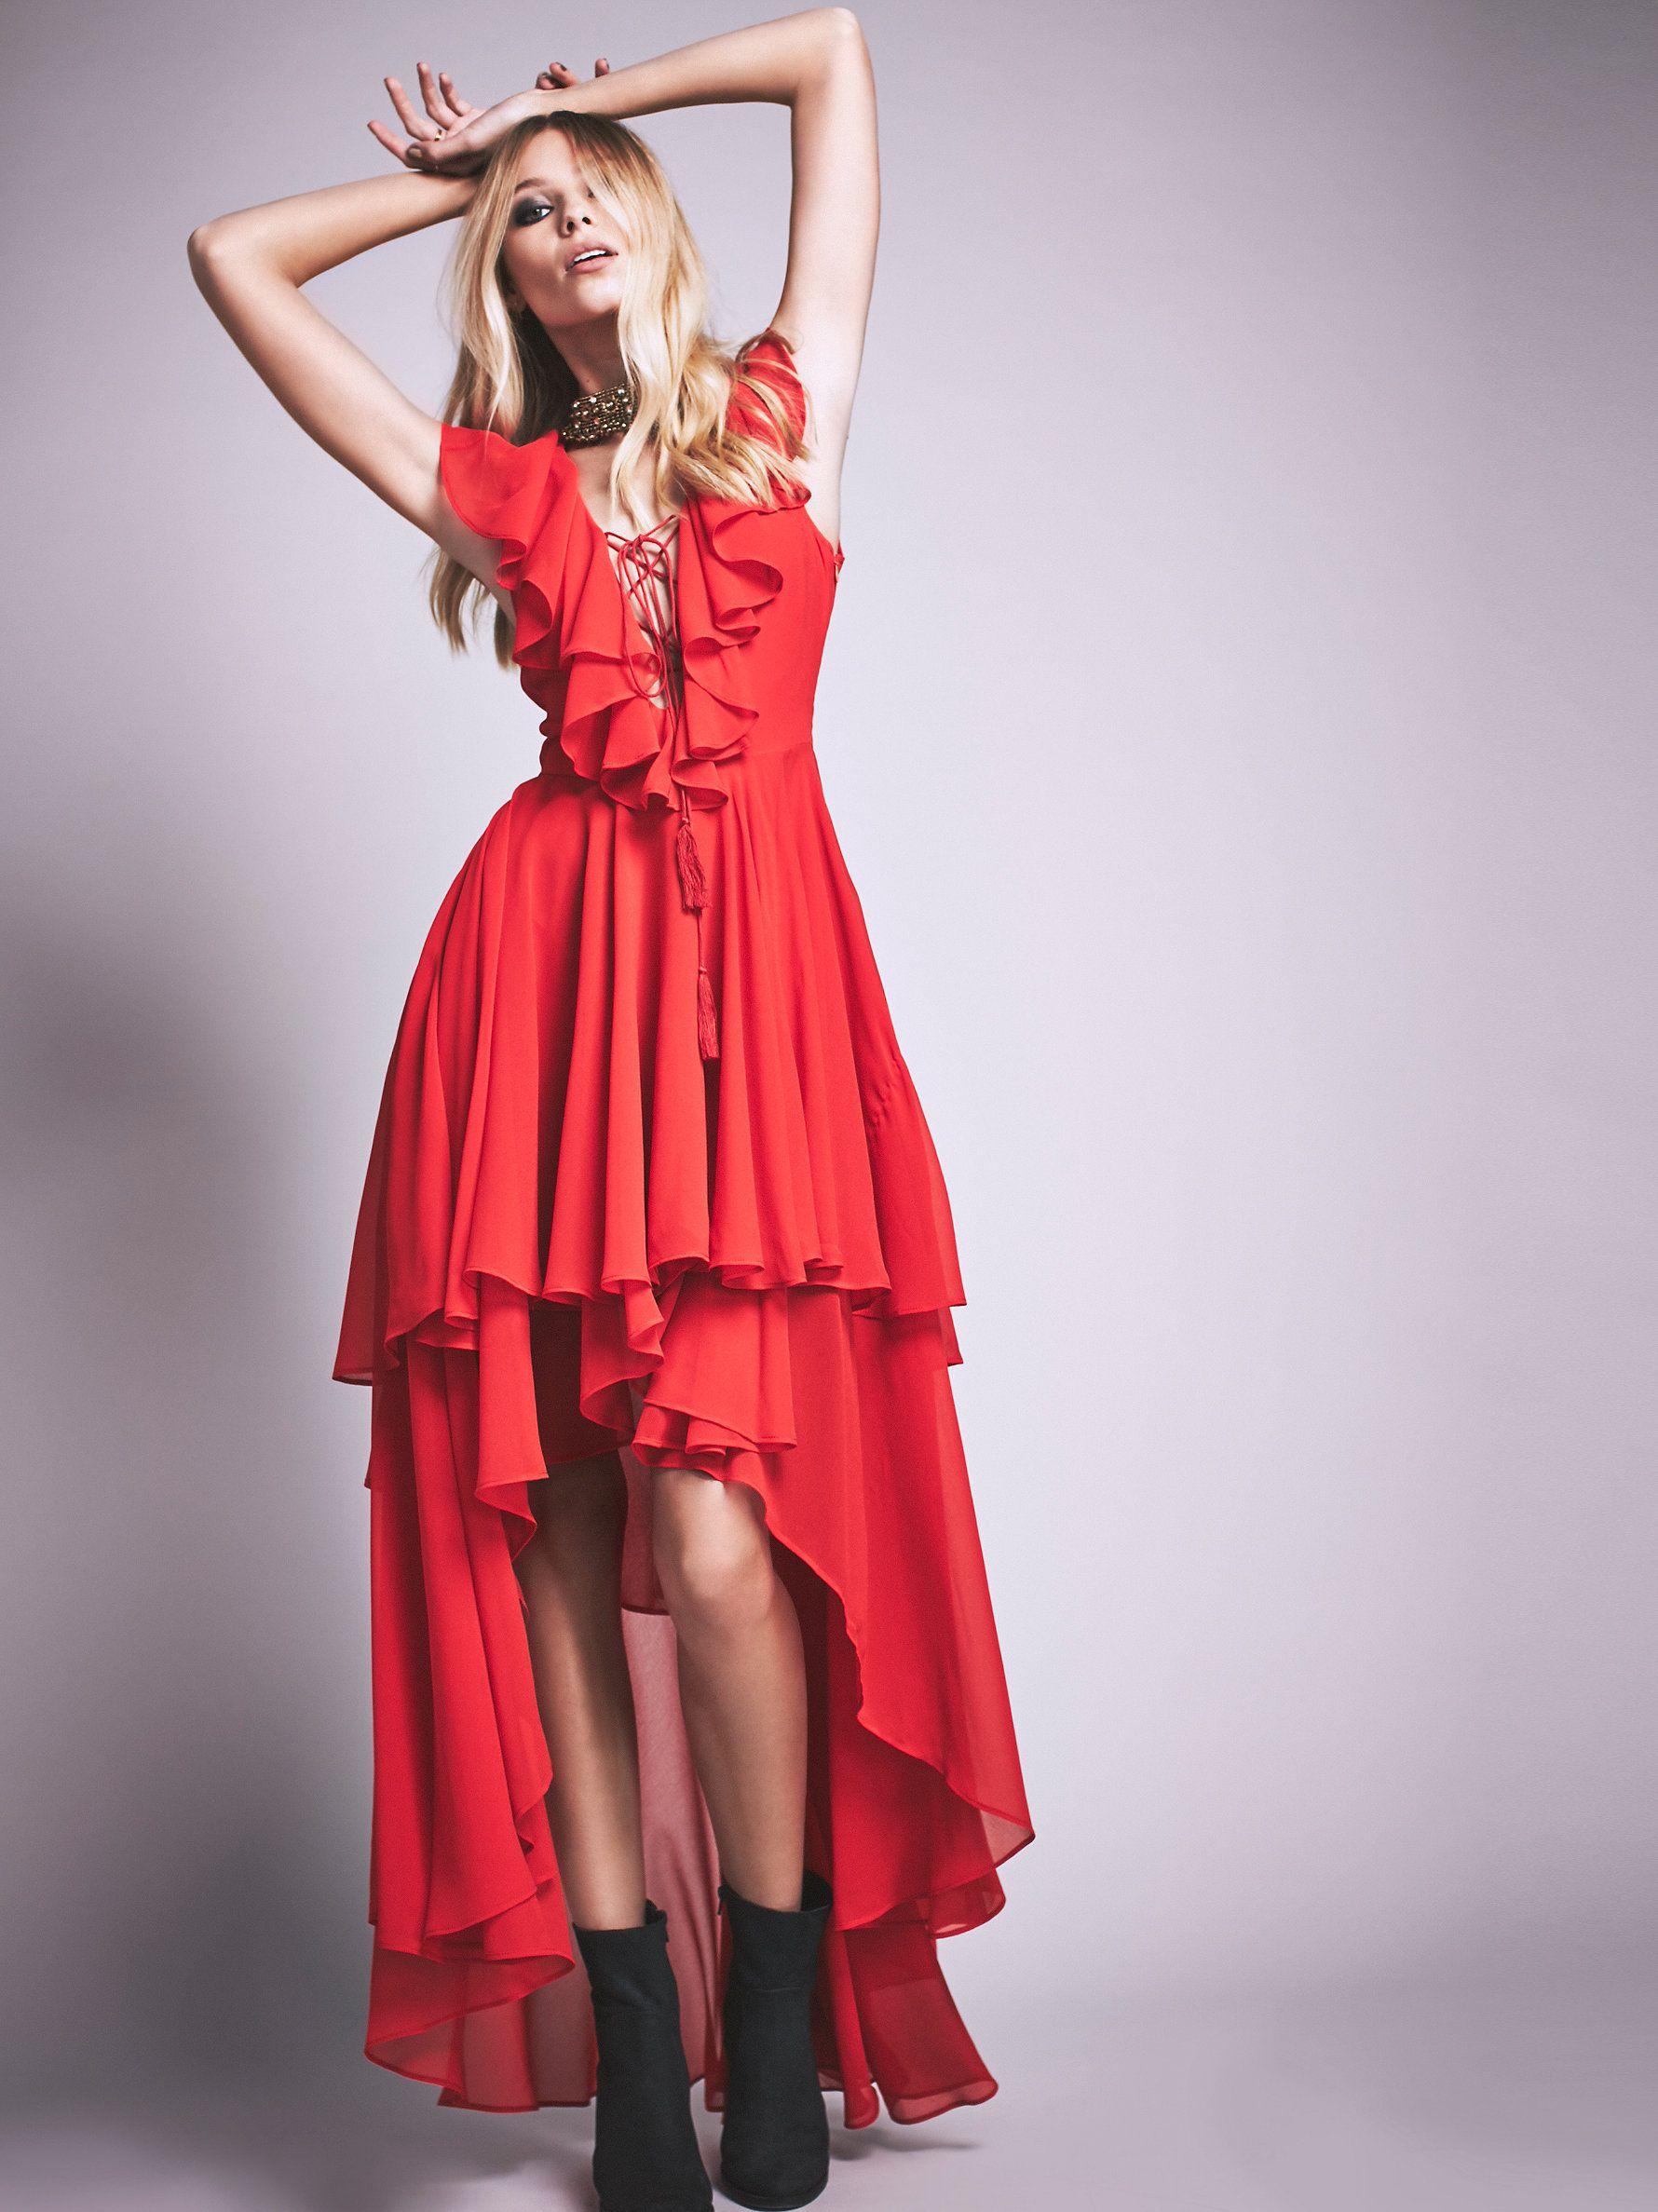 The dress goddess - The Dress Goddess 56